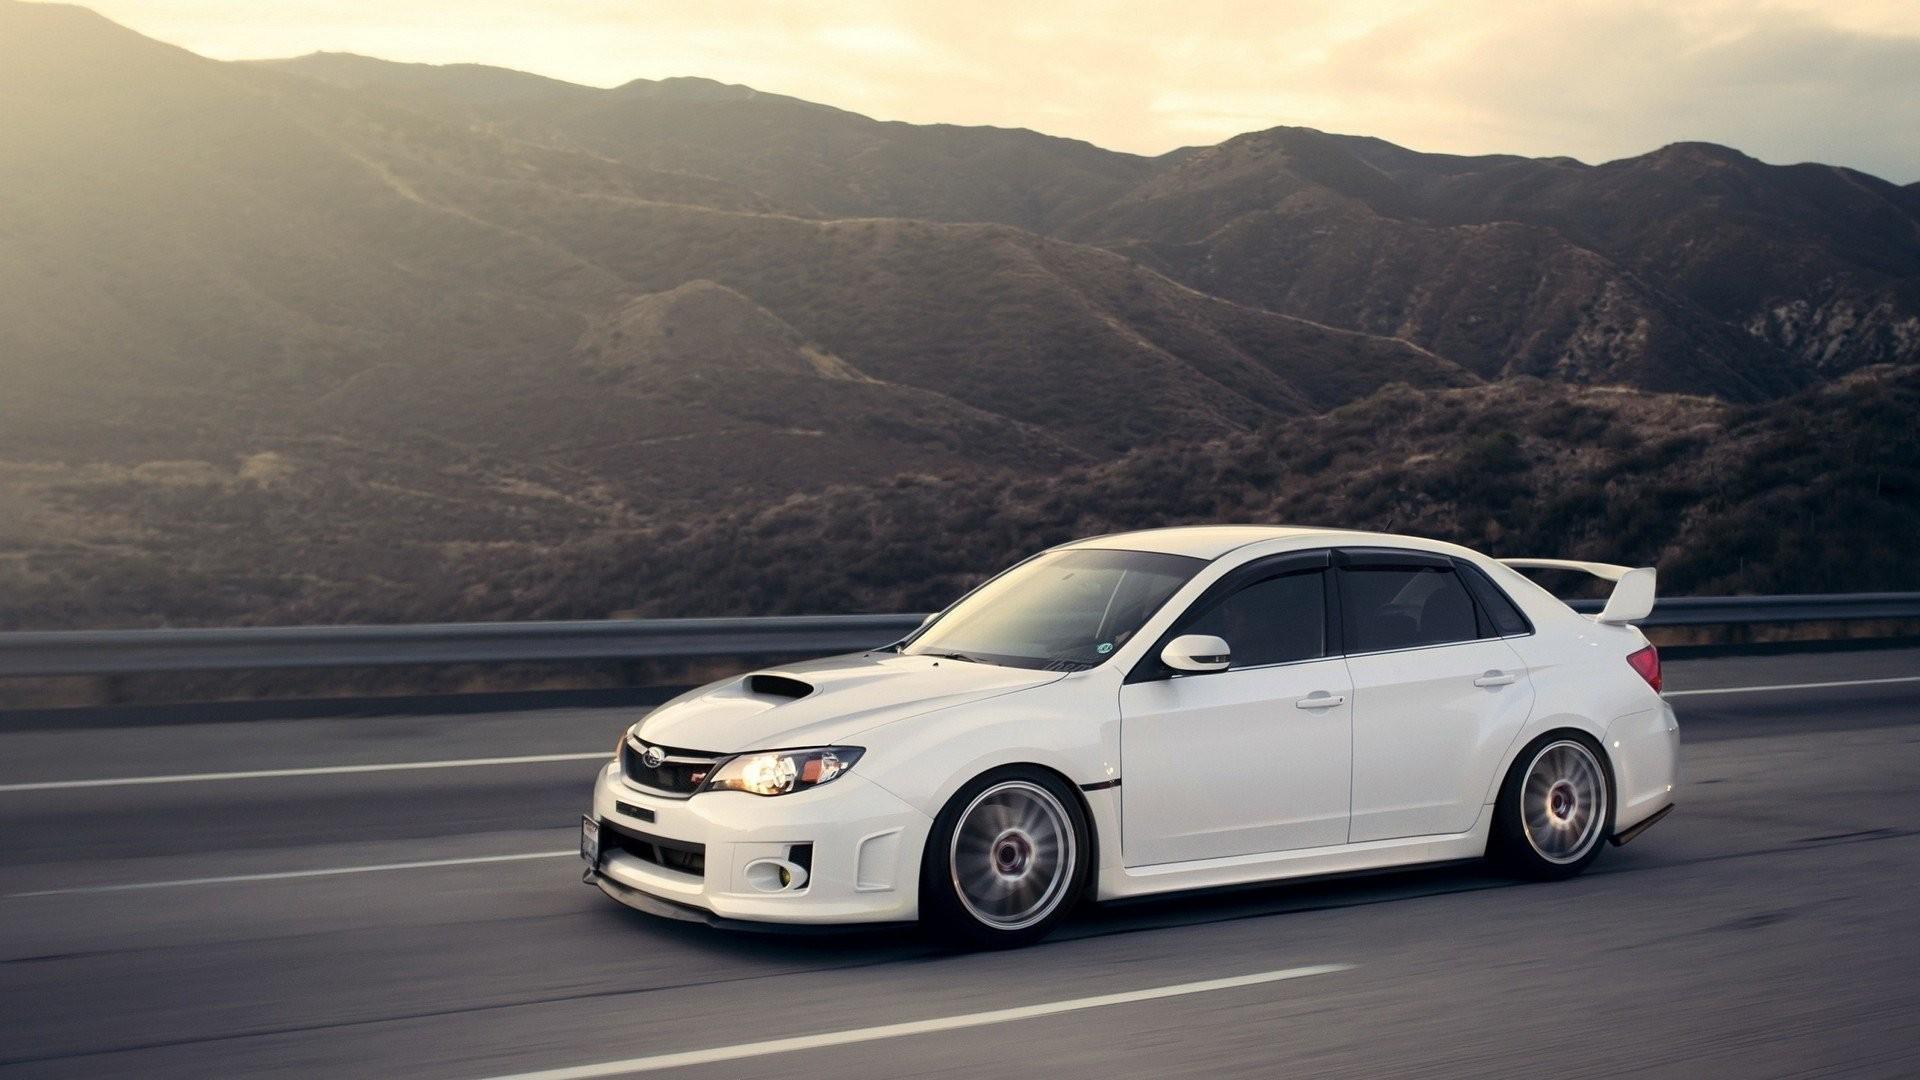 Cars vehicles wheels Subaru Impreza WRX STI automobiles wallpaper |  | 346044 | WallpaperUP